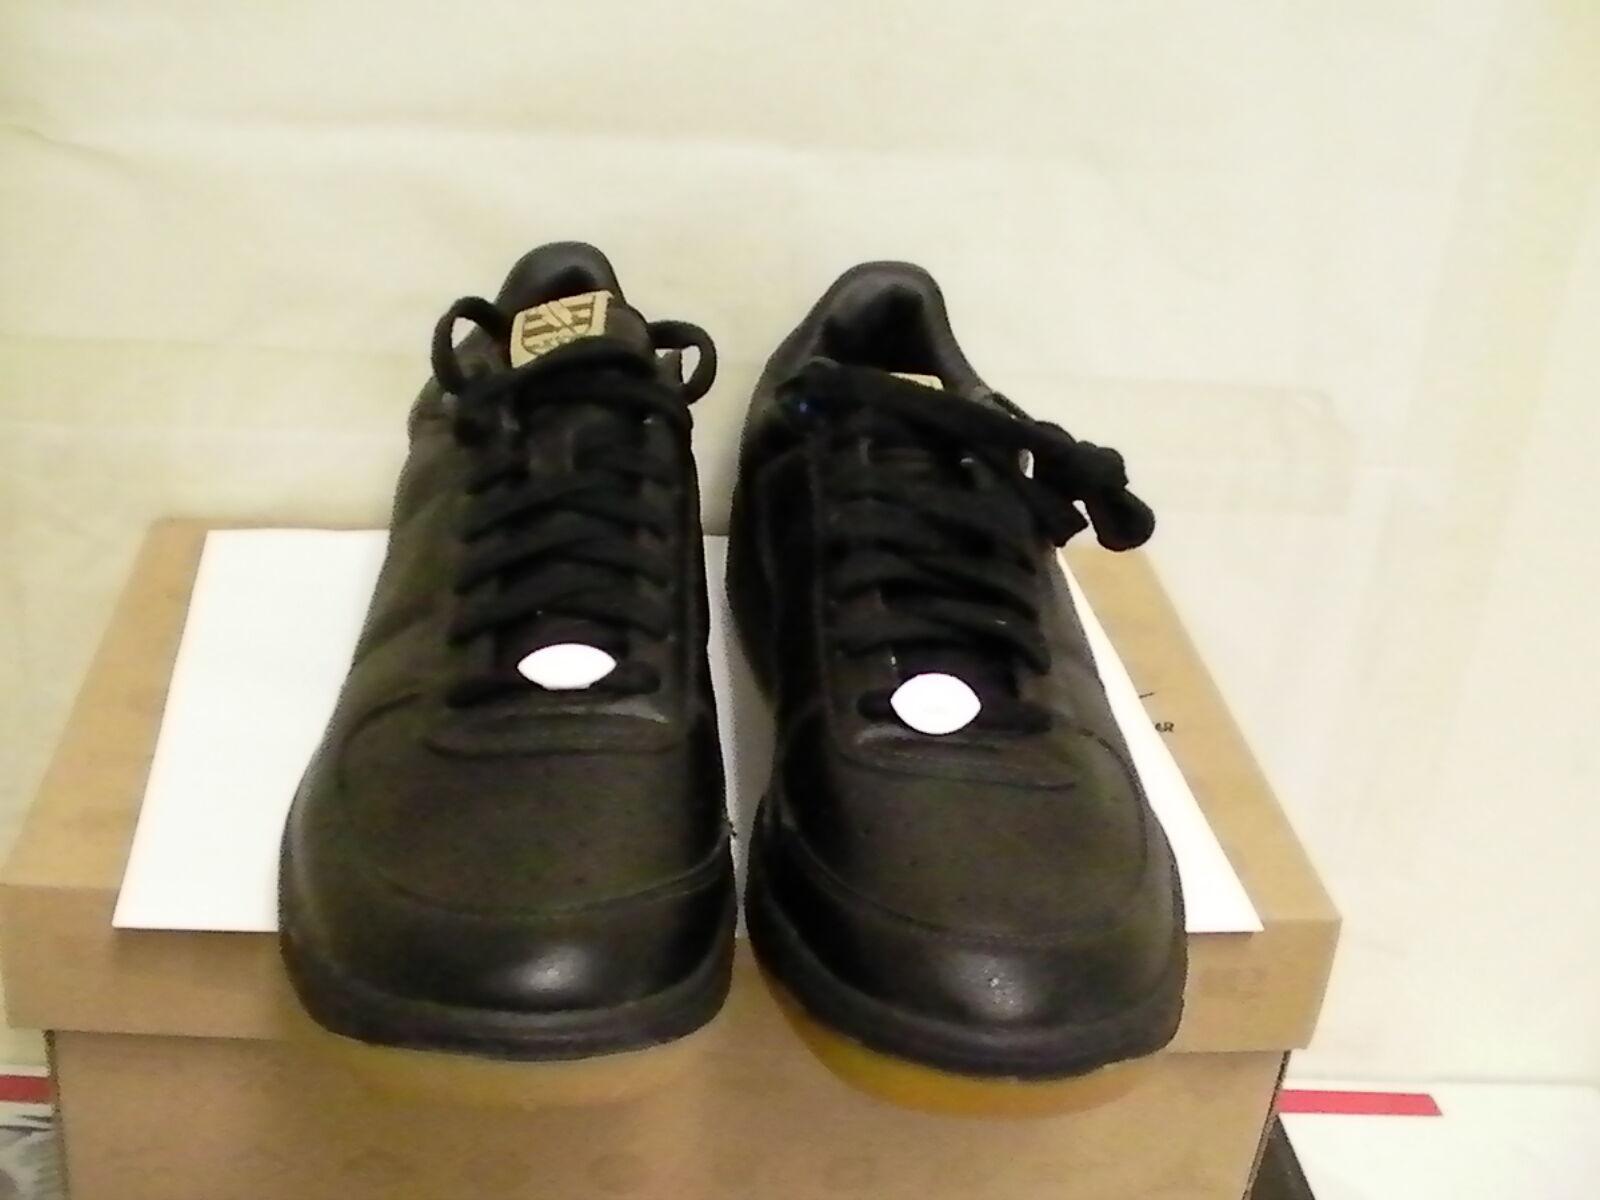 Nike zoom oberste gerichtshof uns niedrige schwarze lederschuhe größe 10,5 uns gerichtshof 2baced